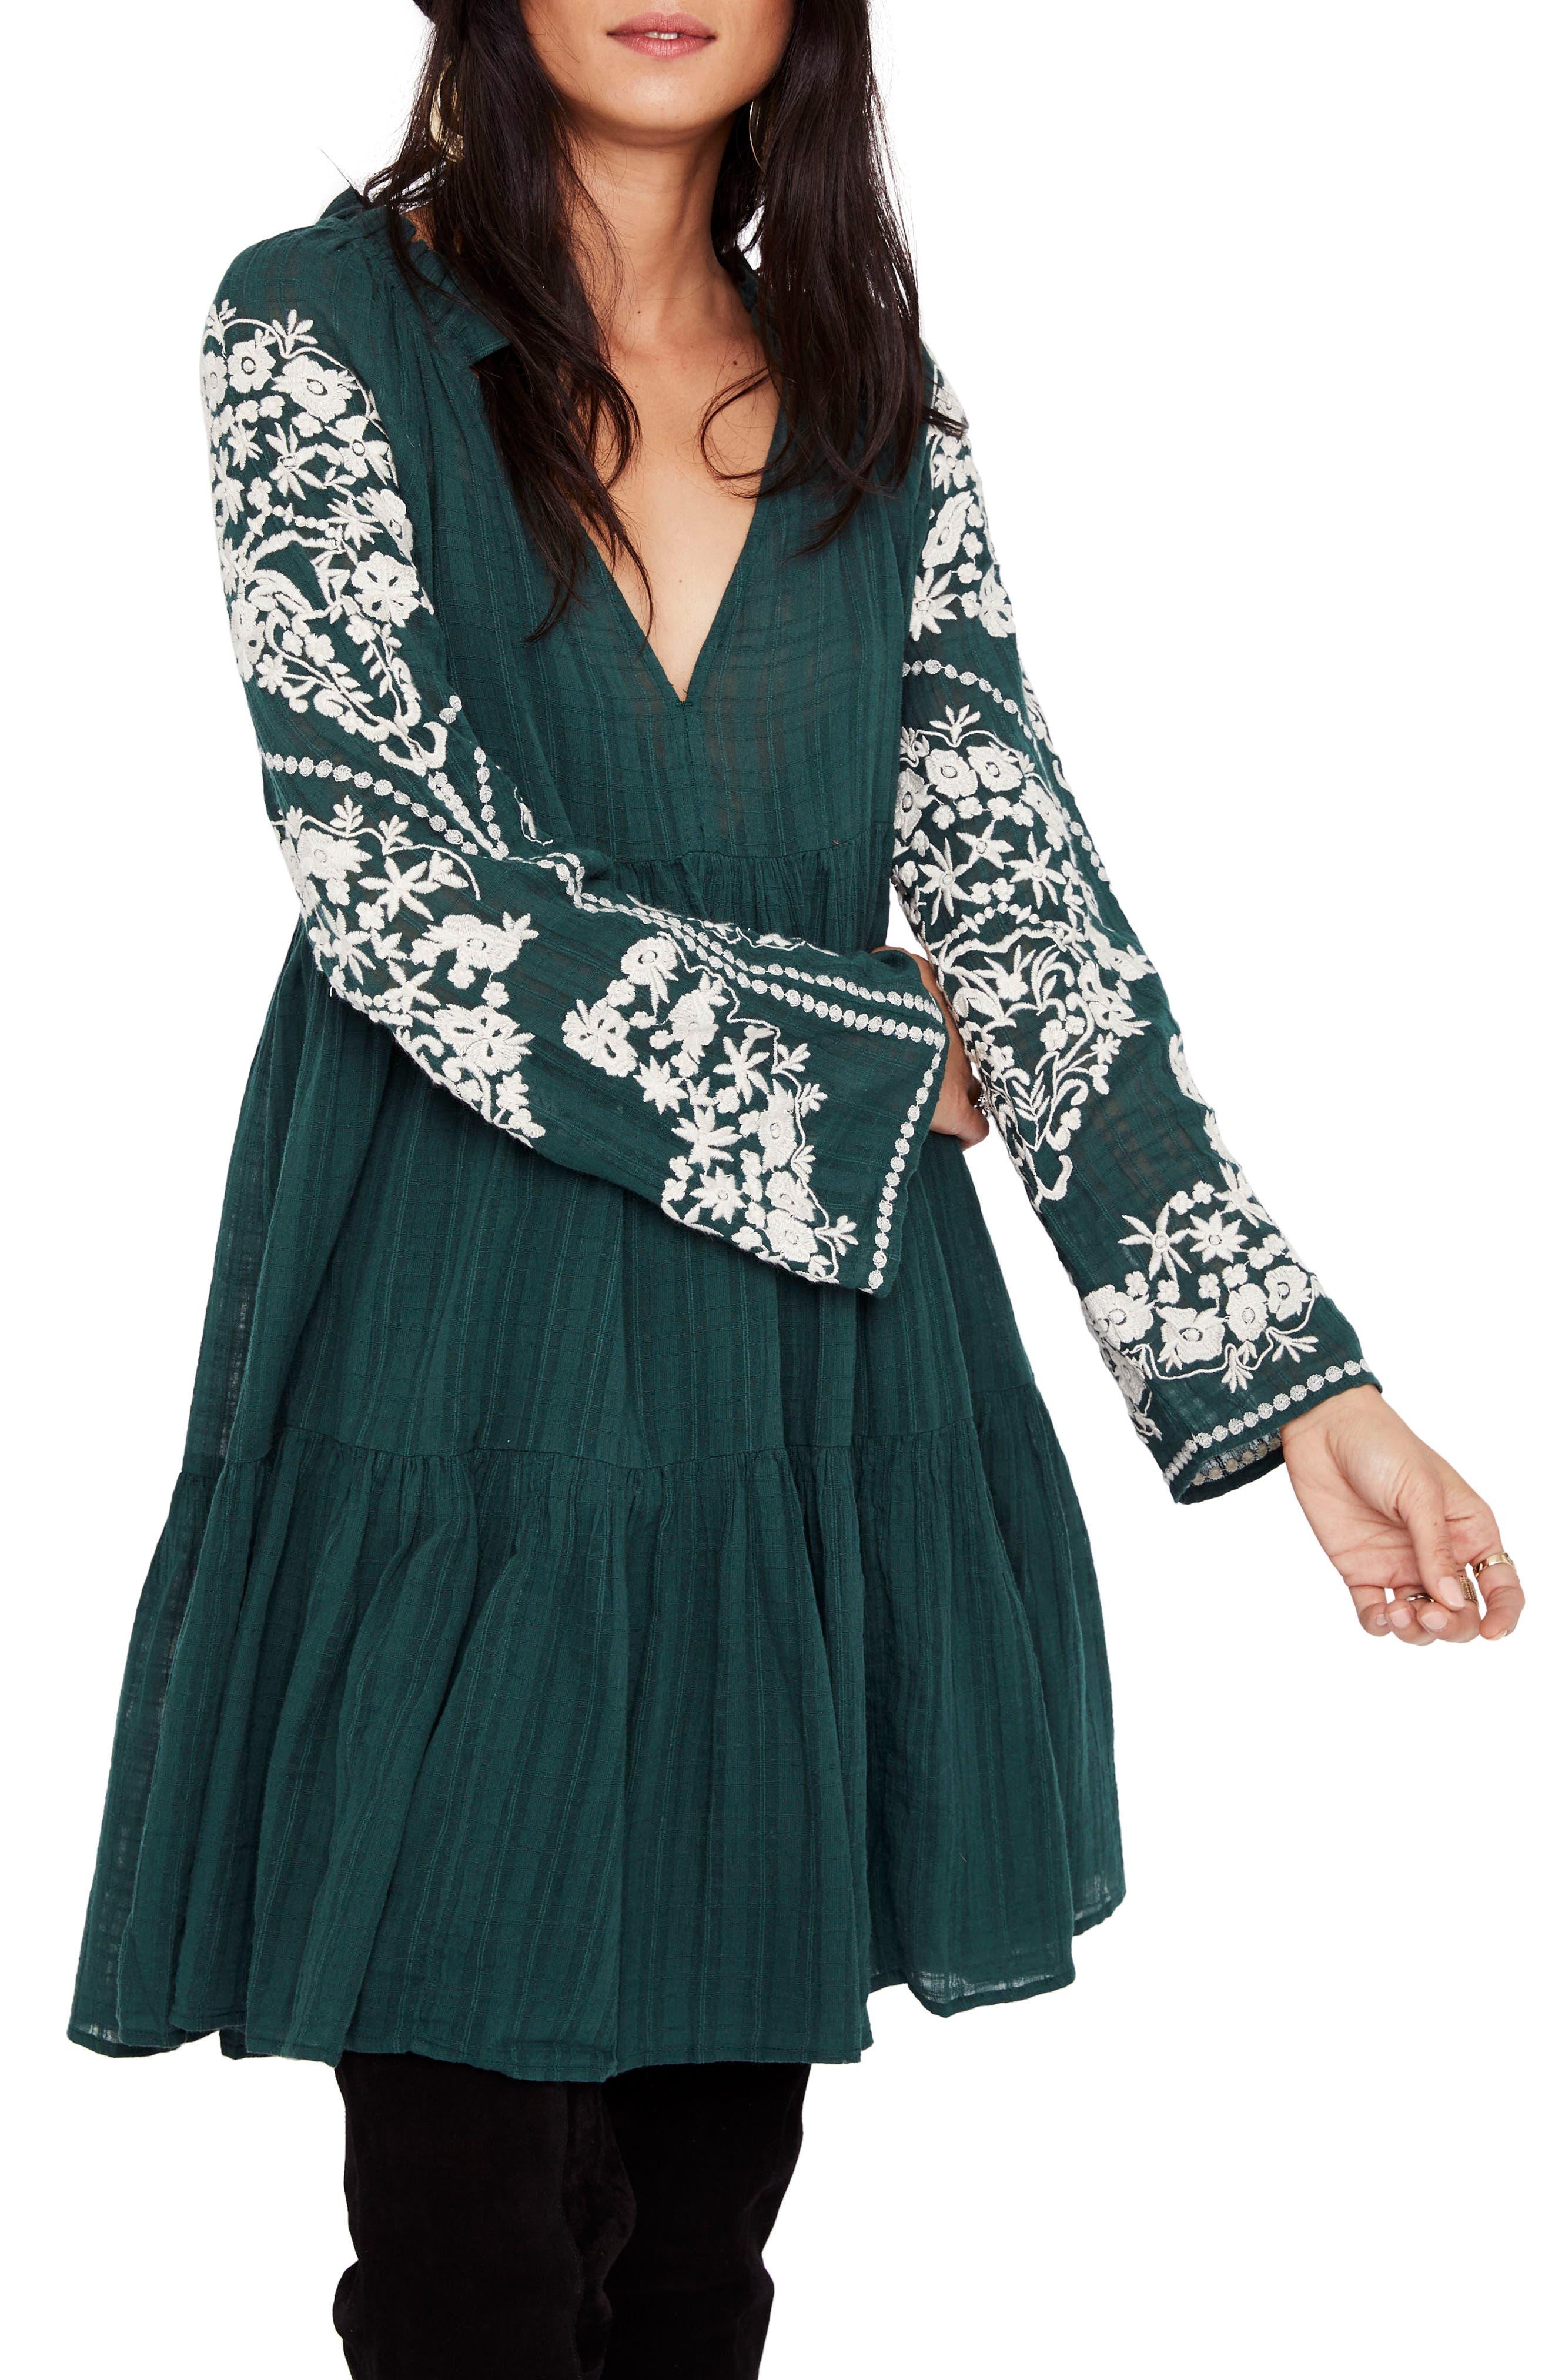 Emerald City Shift Dress,                             Main thumbnail 1, color,                             300